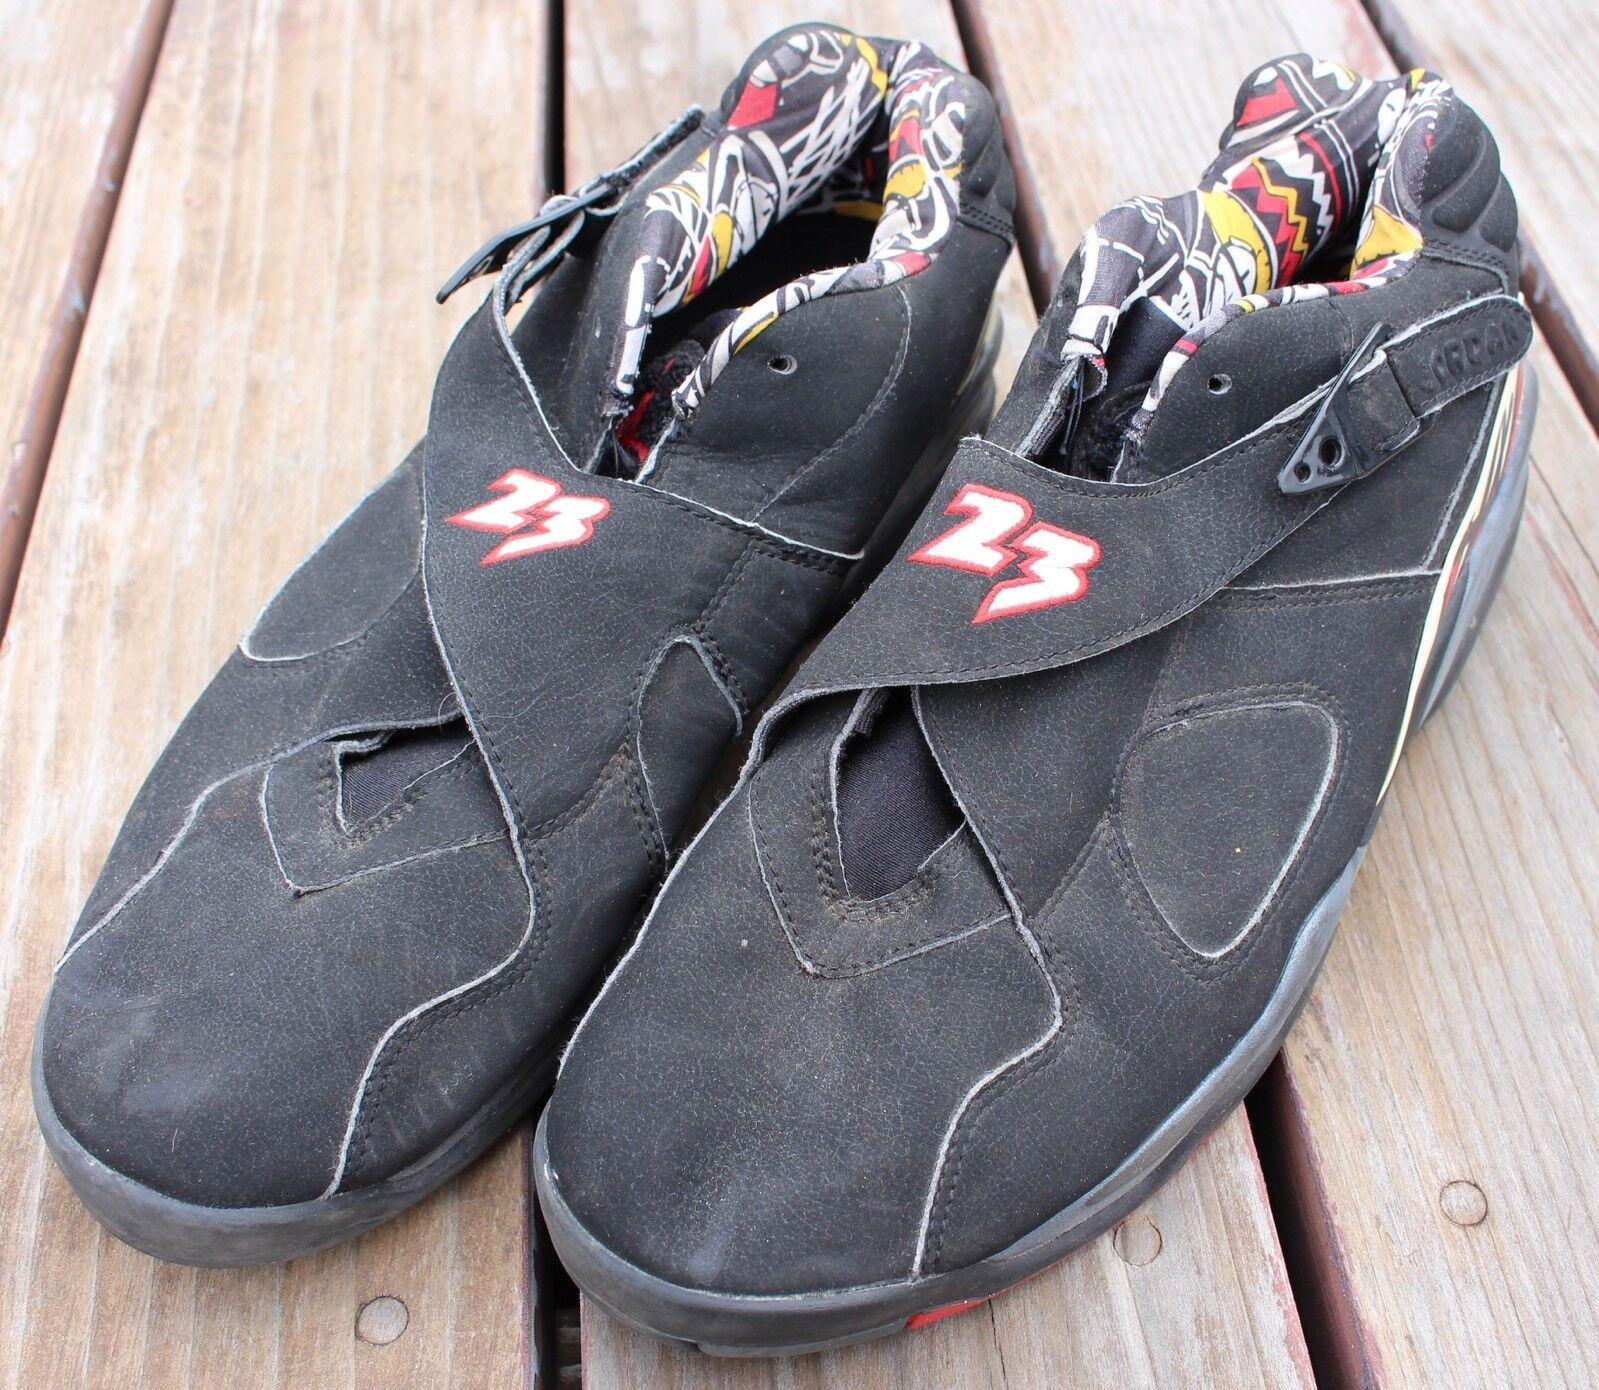 2003 Nike Air Jordan 8 VIII Low Playoffs Black Red Size 13 Retro Shoes 03